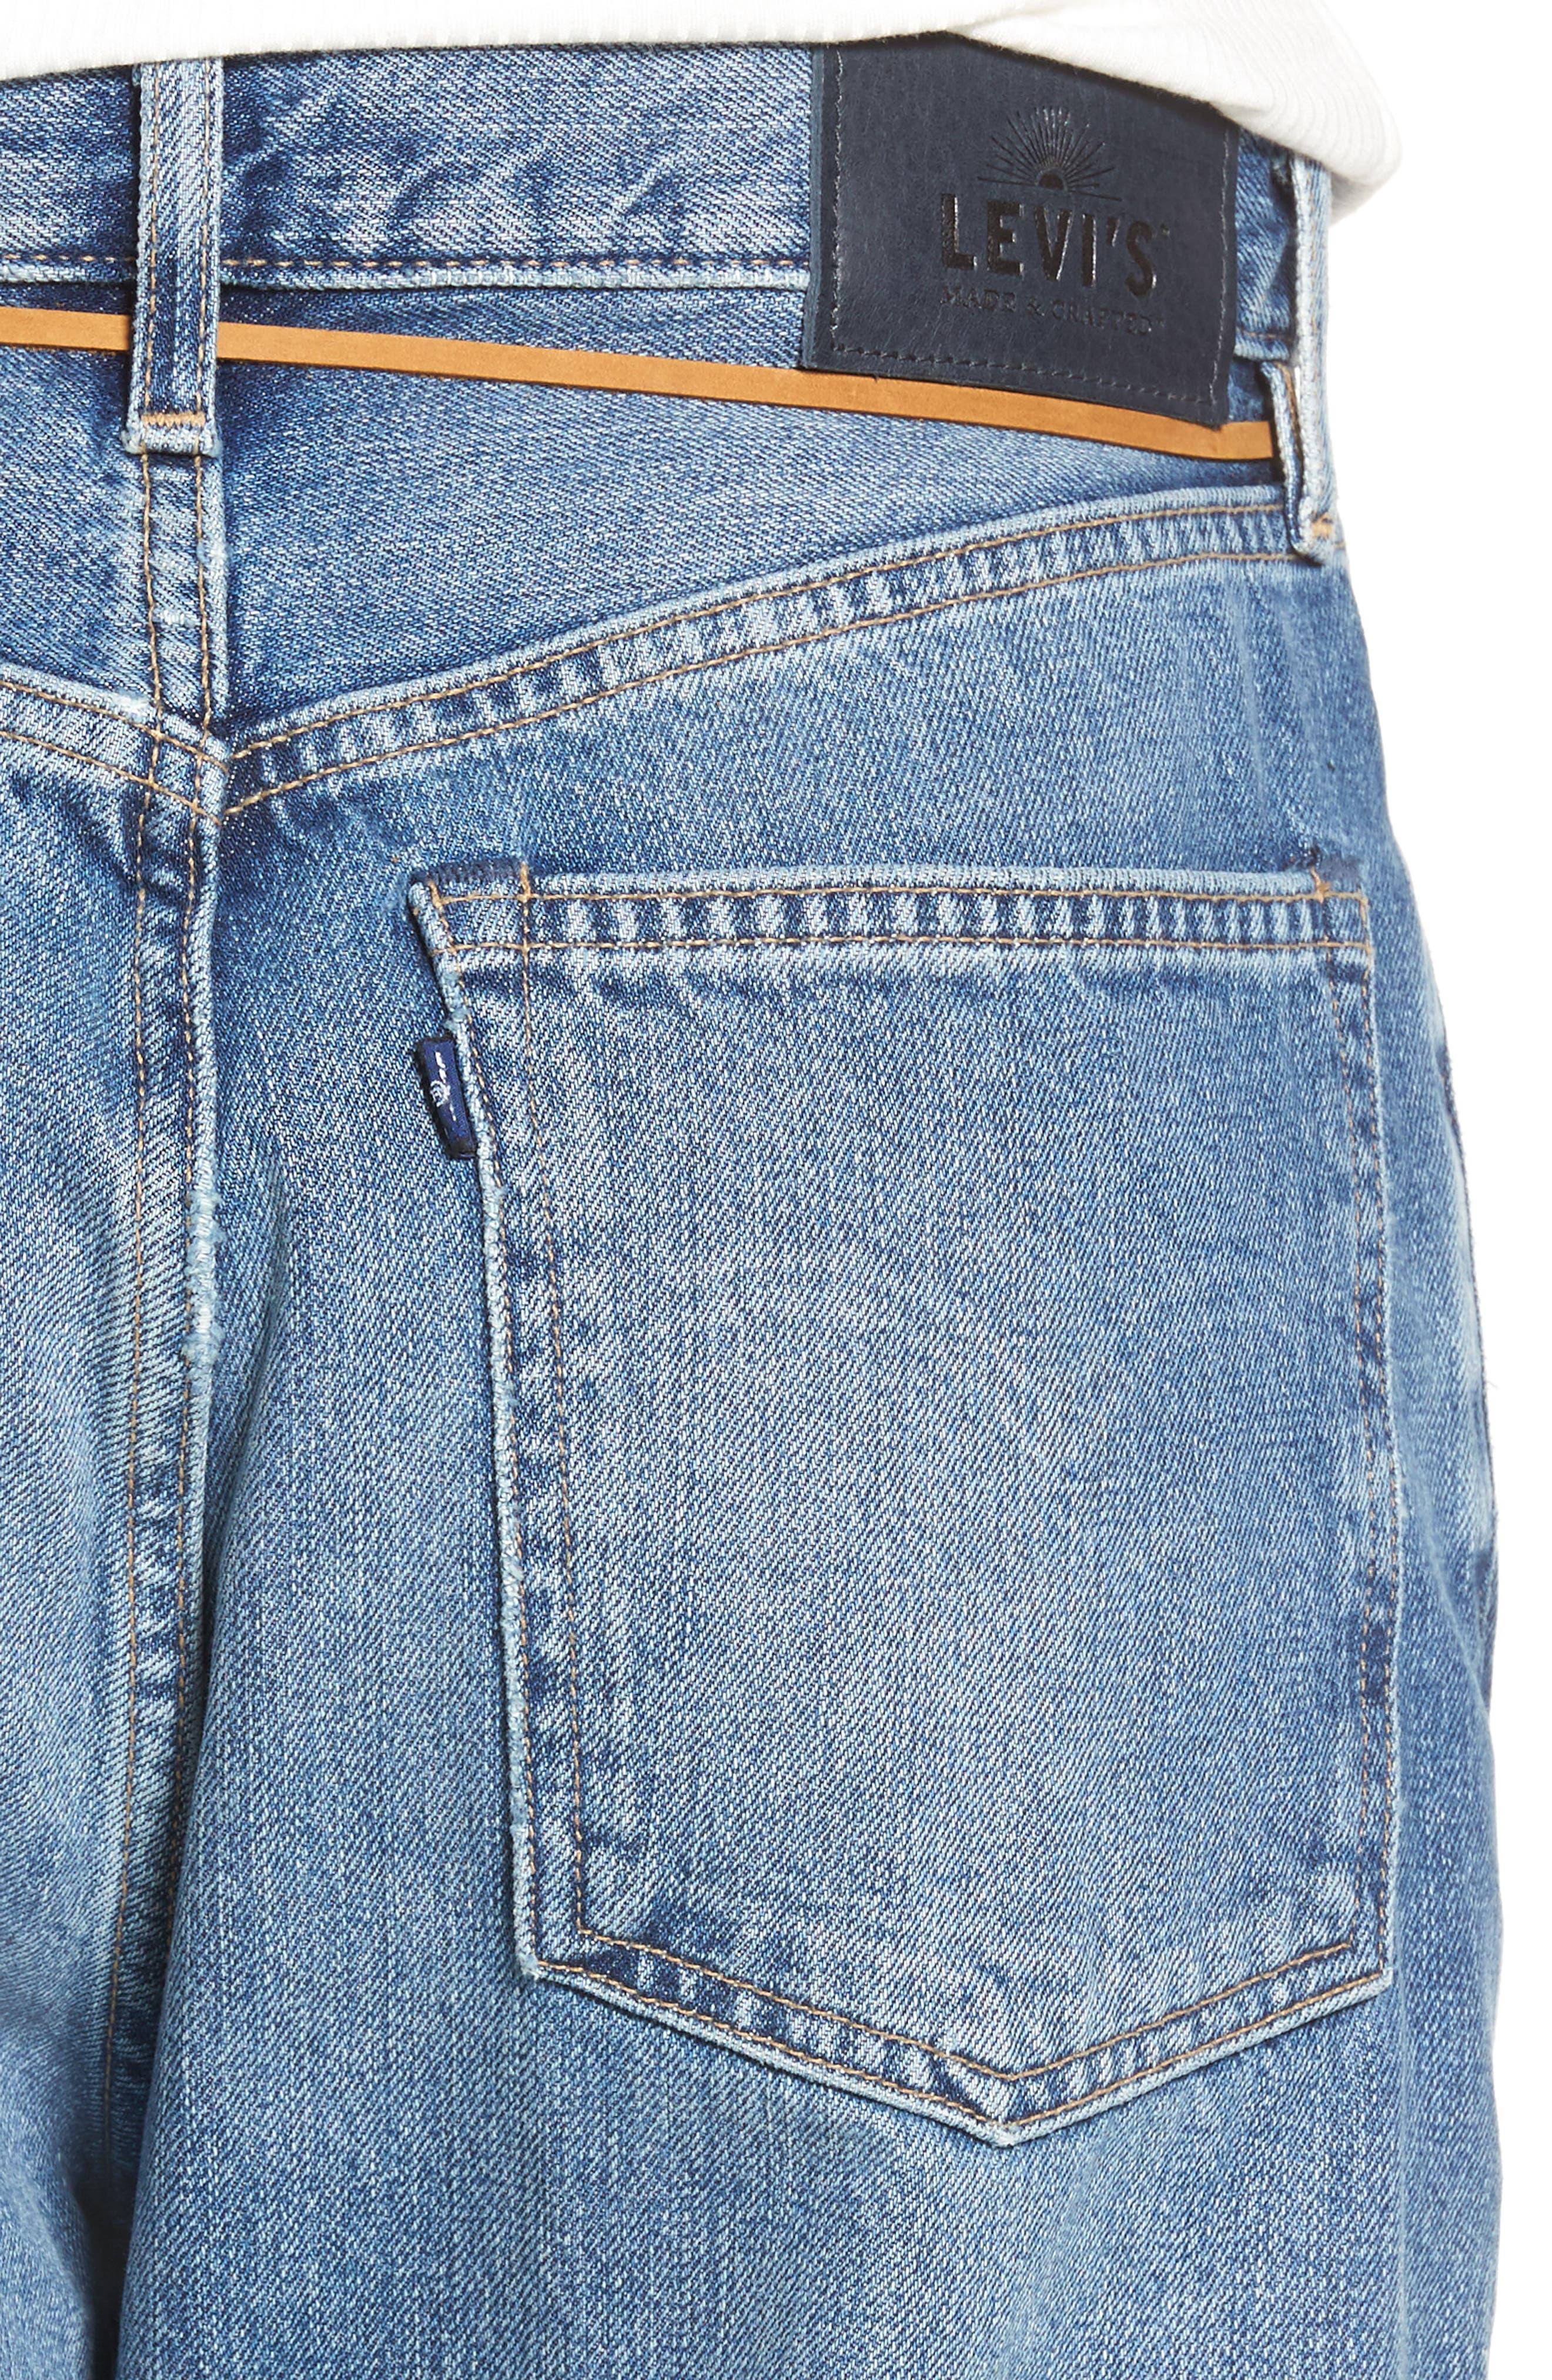 Barrel Jeans,                             Alternate thumbnail 4, color,                             J-Bay